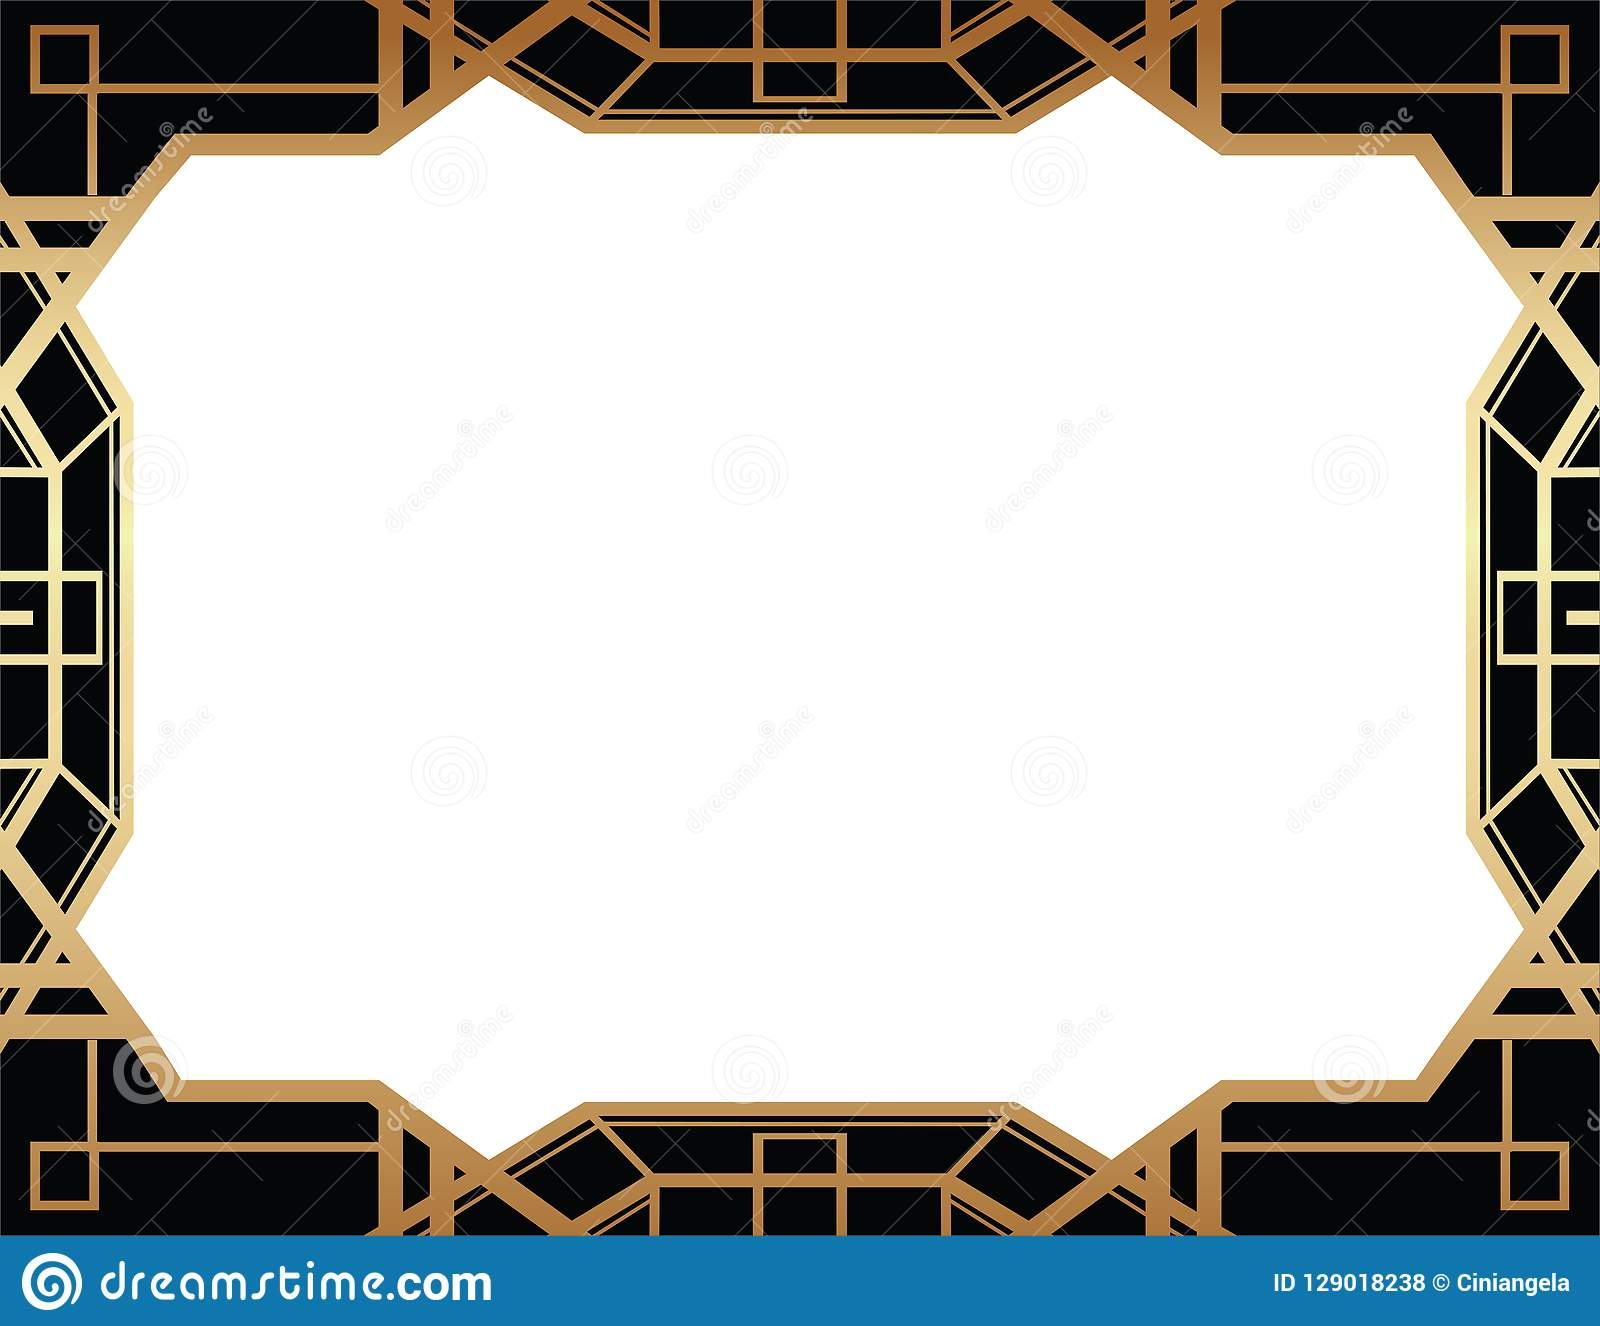 Geometrisches Design Gatsby Art Deco Style Border Frame Vektor